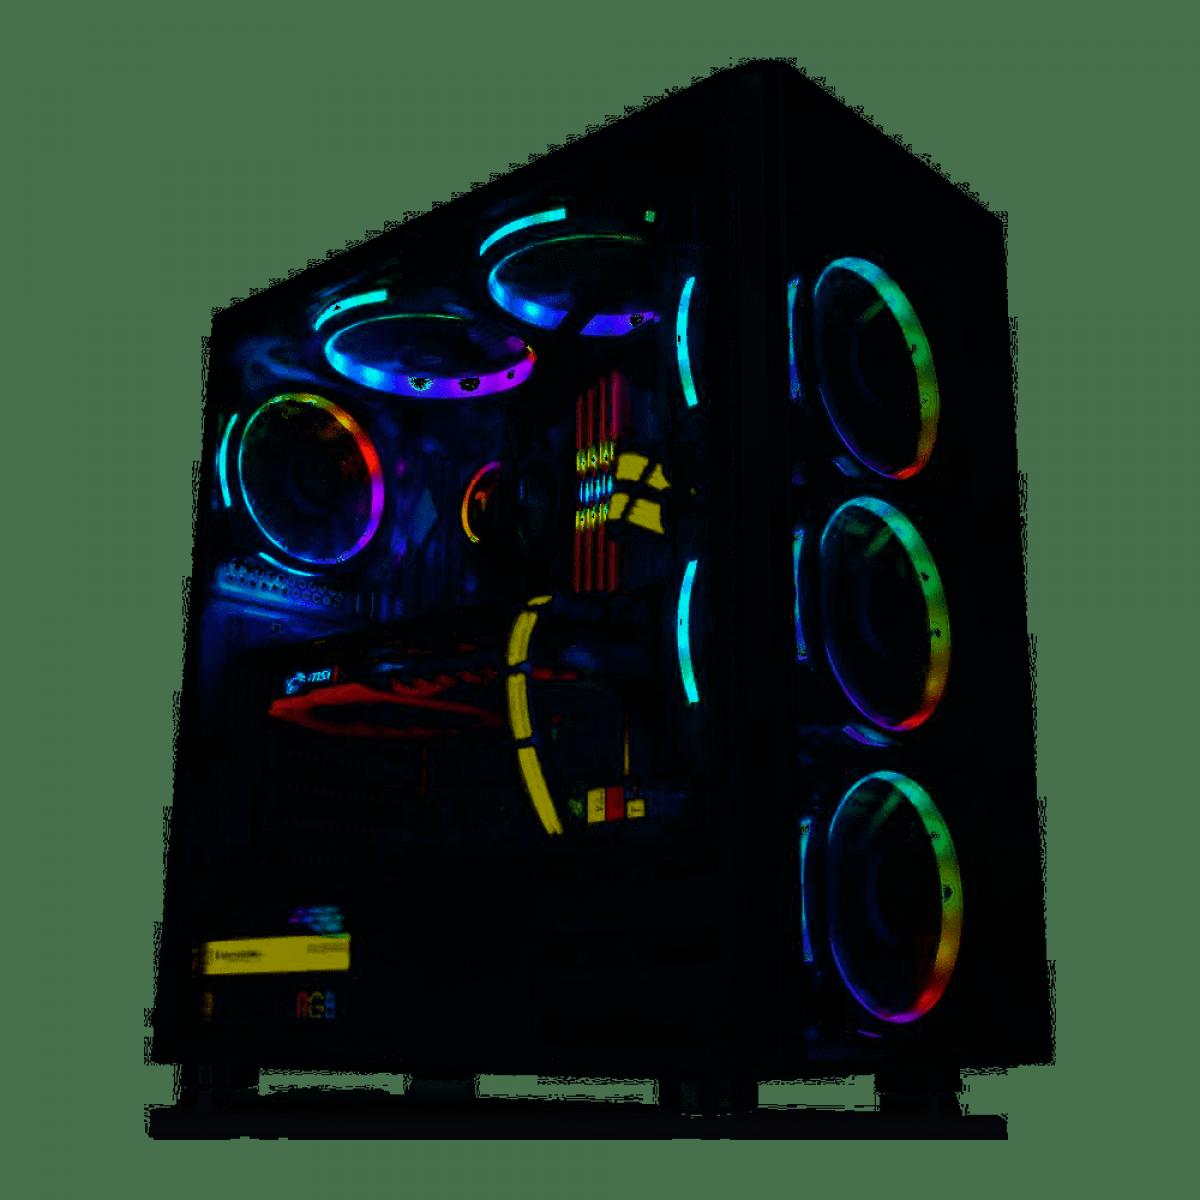 Gabinete Gamer Thermaltake V200, Mid Tower, Com 1 Fan, Vidro temperado, Black, S-Fonte, CA-3K8-50M1WZ-01